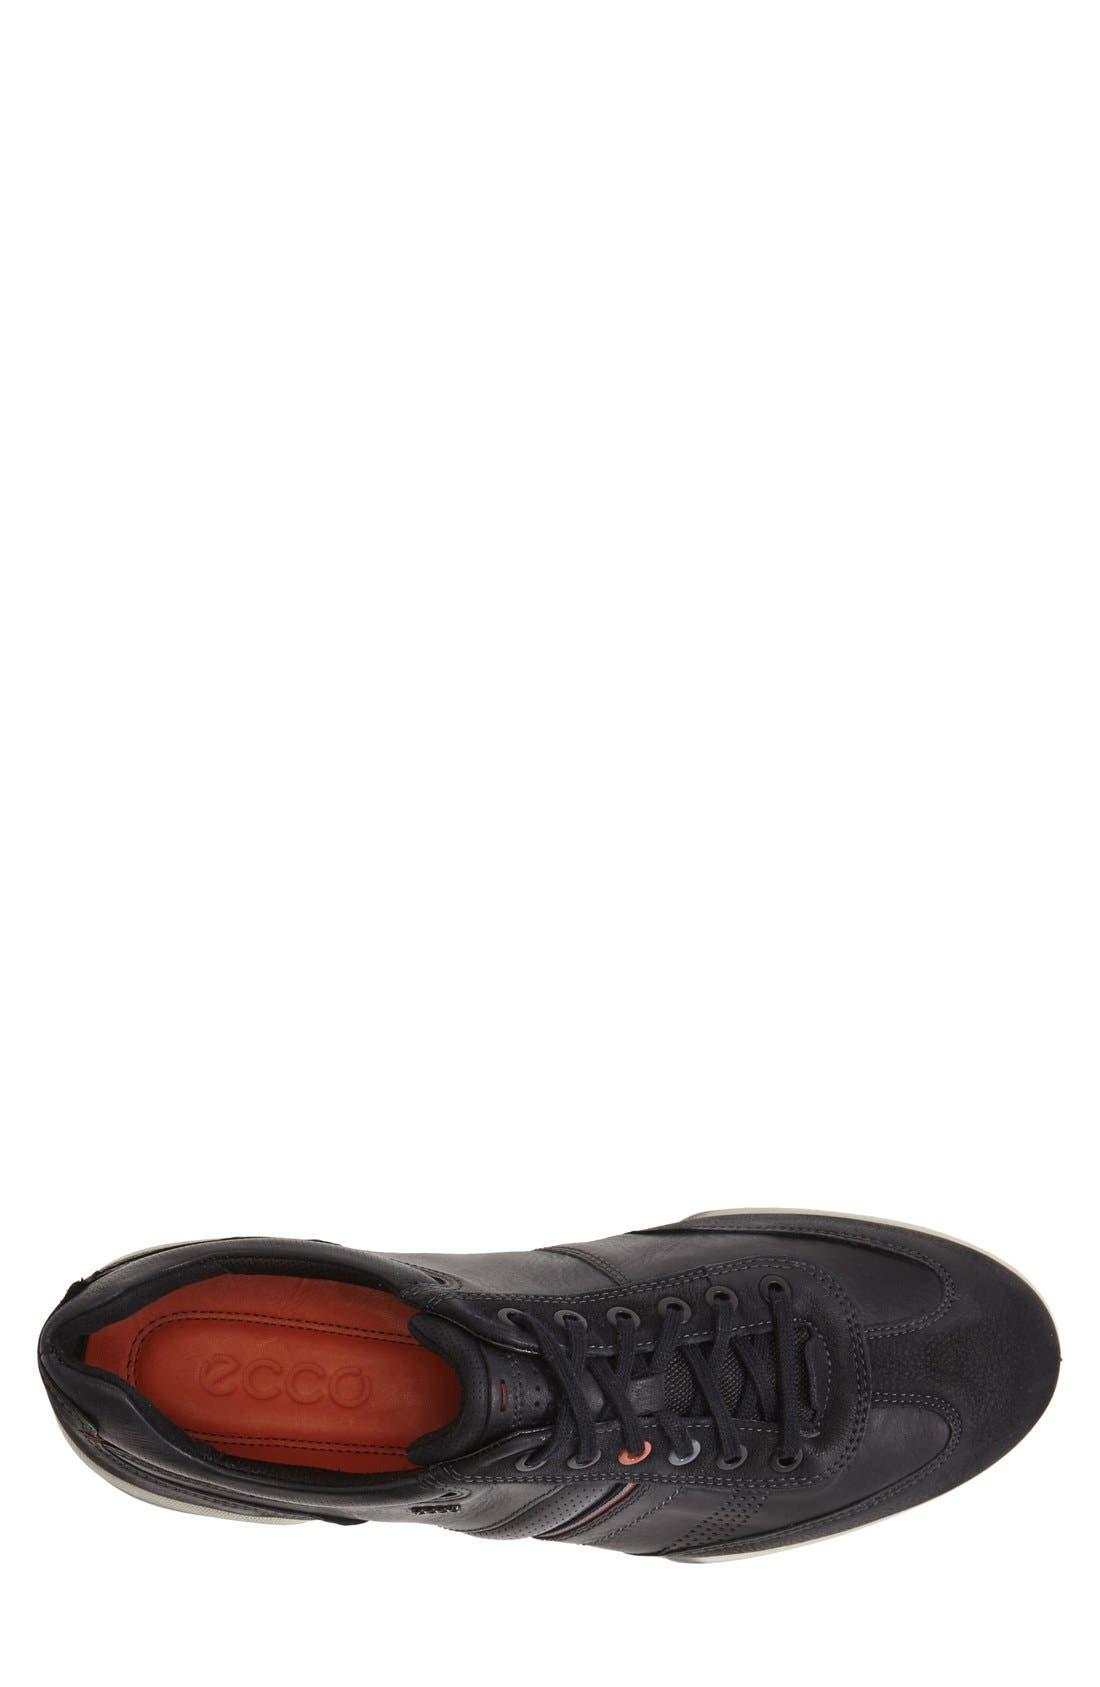 'Enrico' Sneaker,                             Alternate thumbnail 4, color,                             001